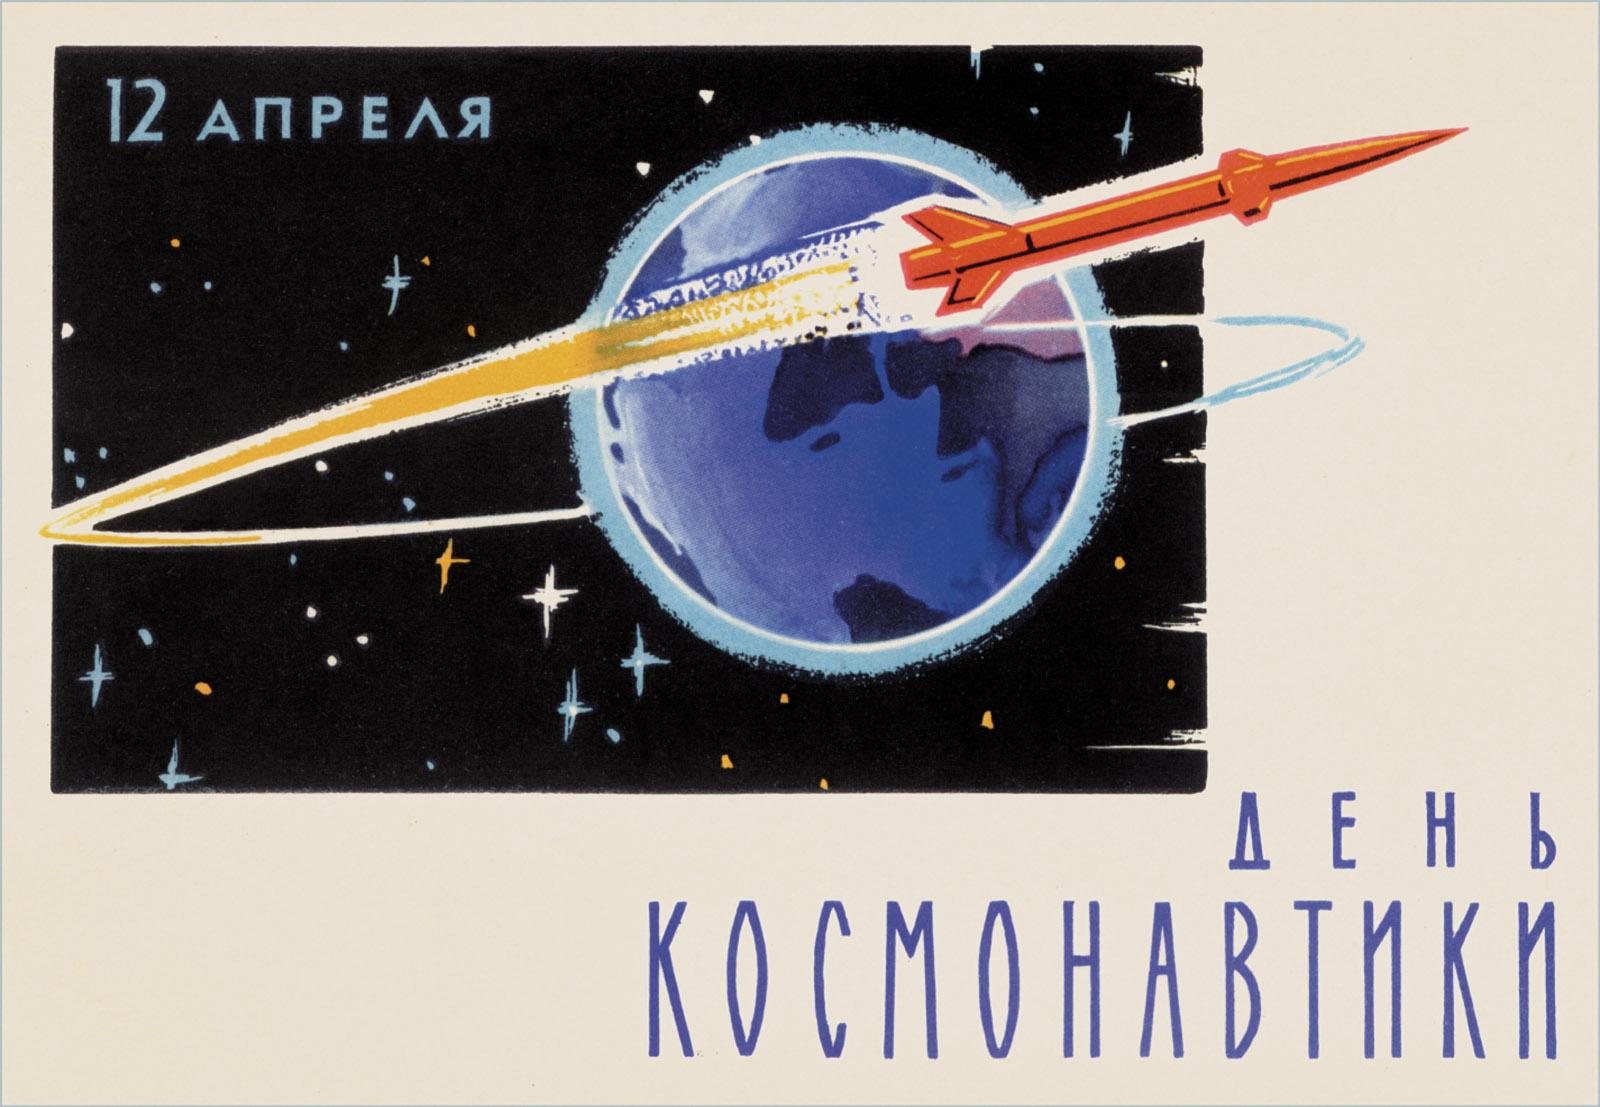 A Soviet illustration commemorating Yuri Gagarin's orbit of Earth, 1960s